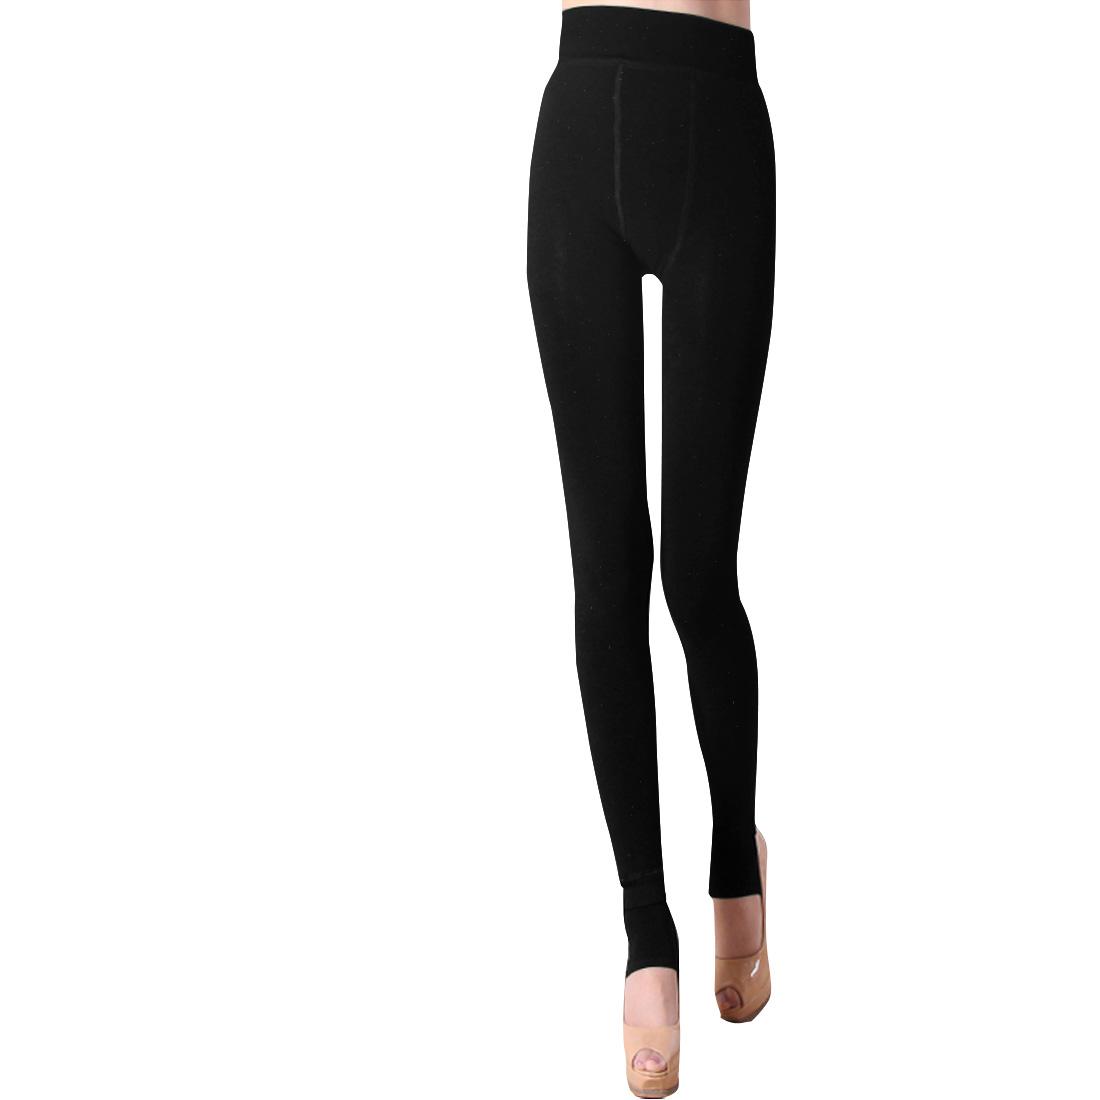 Woman Elastic Waist Warm Fleece Lined Black Stirrup Leggings XS